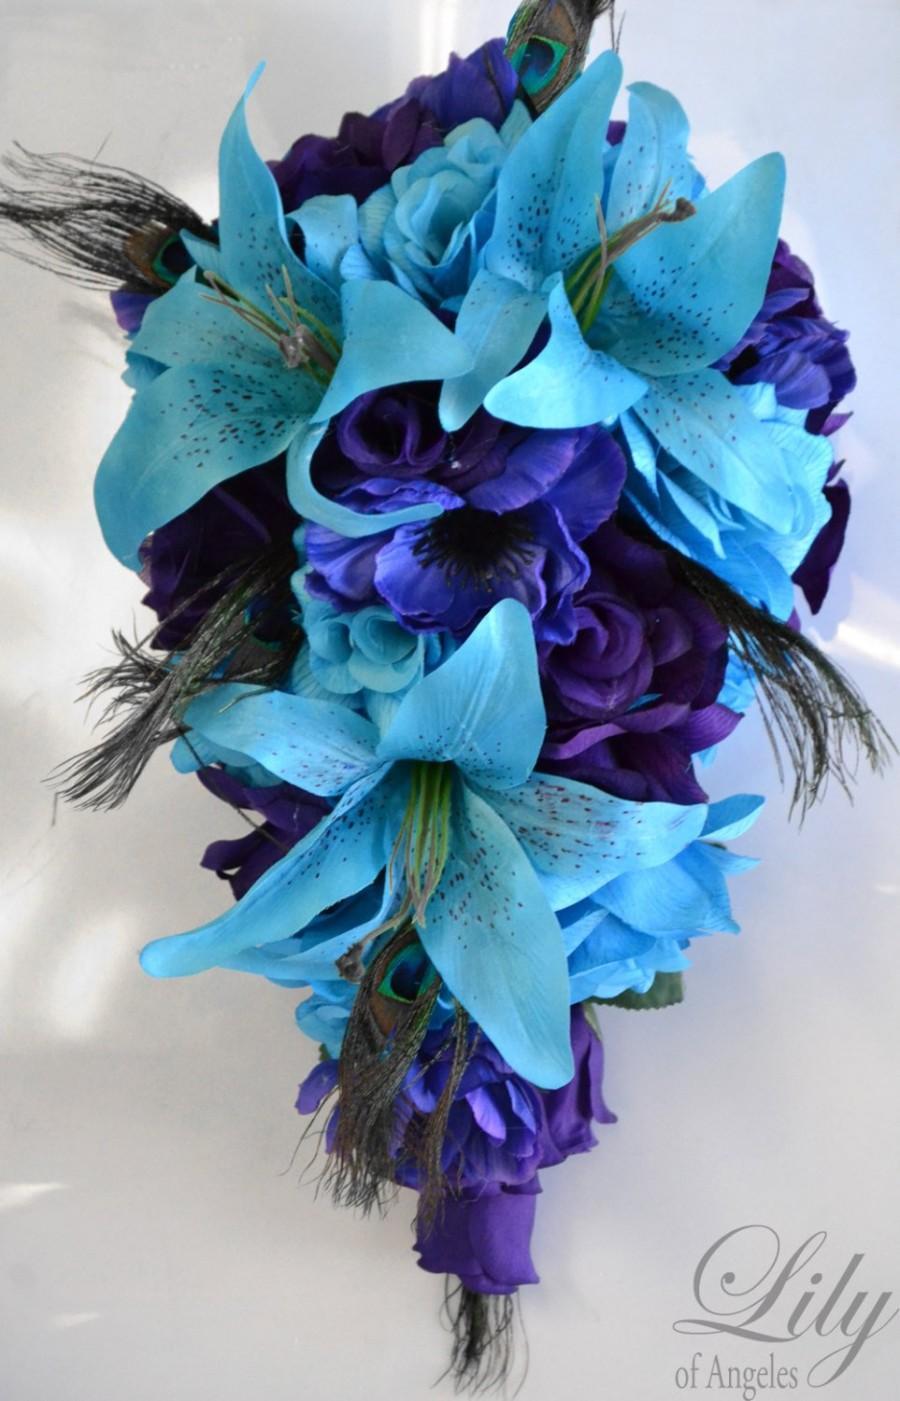 Hochzeit - Wedding Bouquet, Bridal Cascade Bouquet, Teardrop Bouquet, Cascade, 17 Piece Package, PURPLE, TURQUOISE, MALIBU, Peacock, Lily Of Angeles